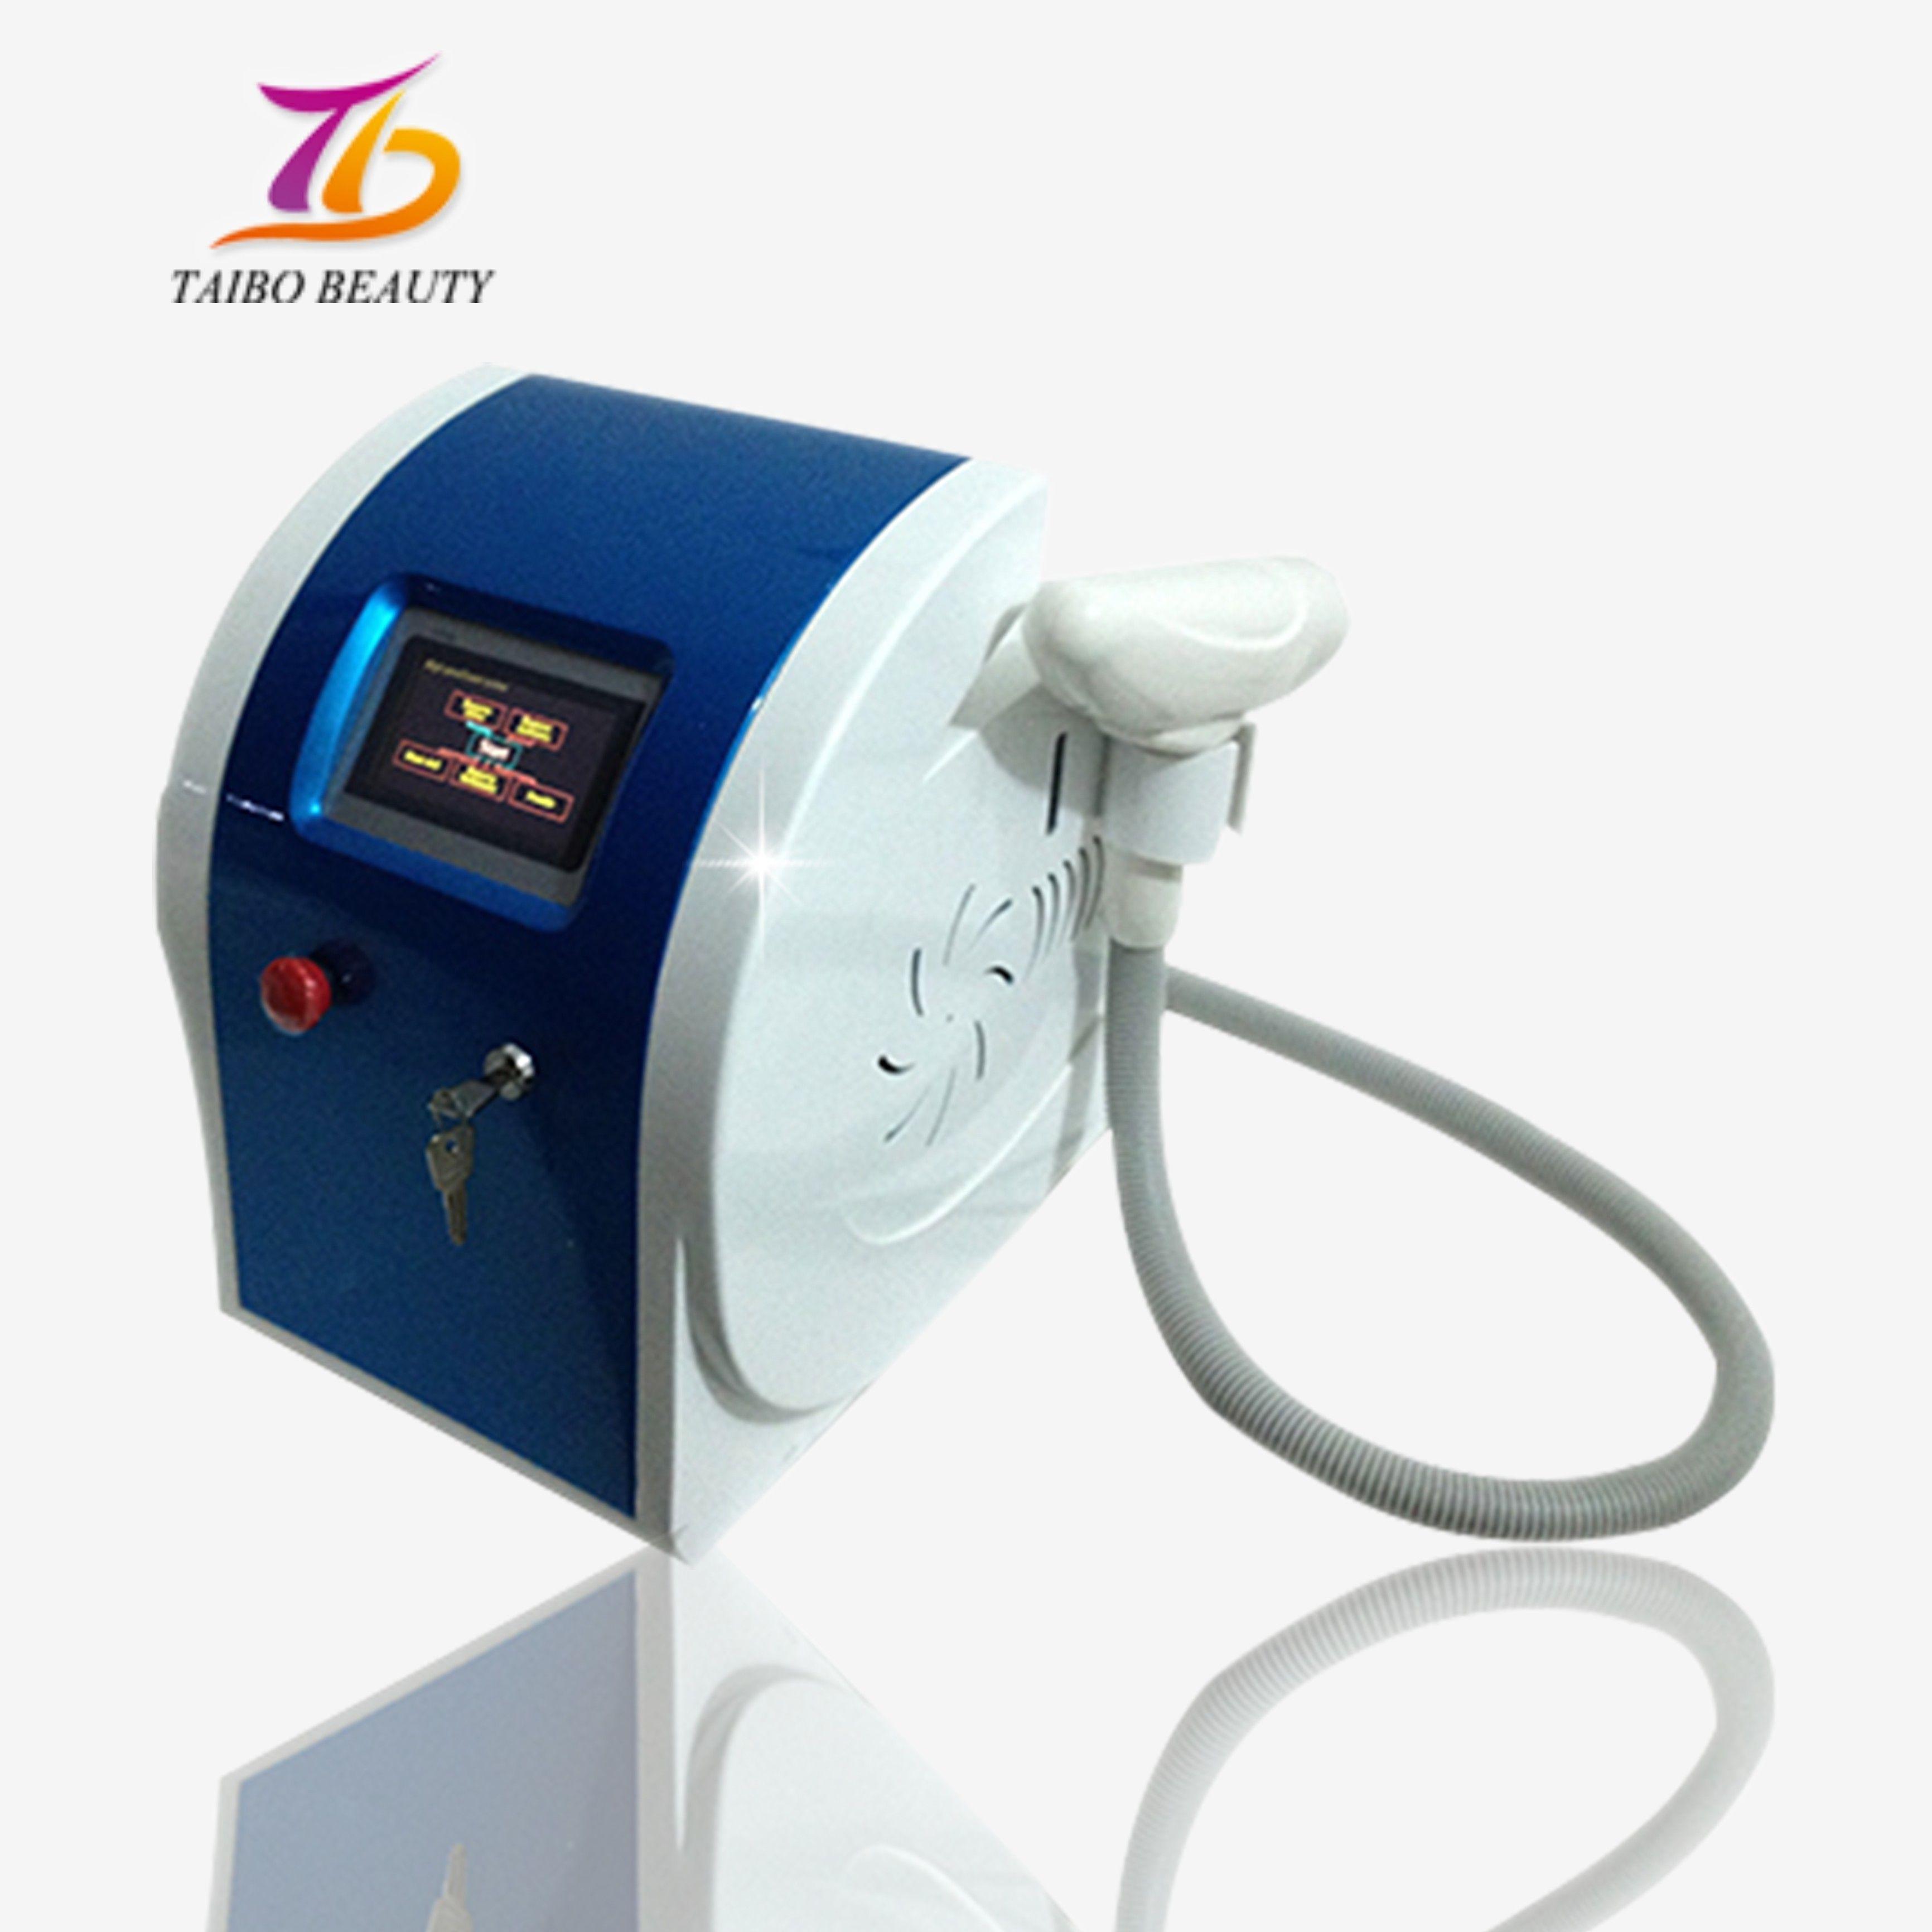 portable tattoo removal machine Pigmented lesions Remove